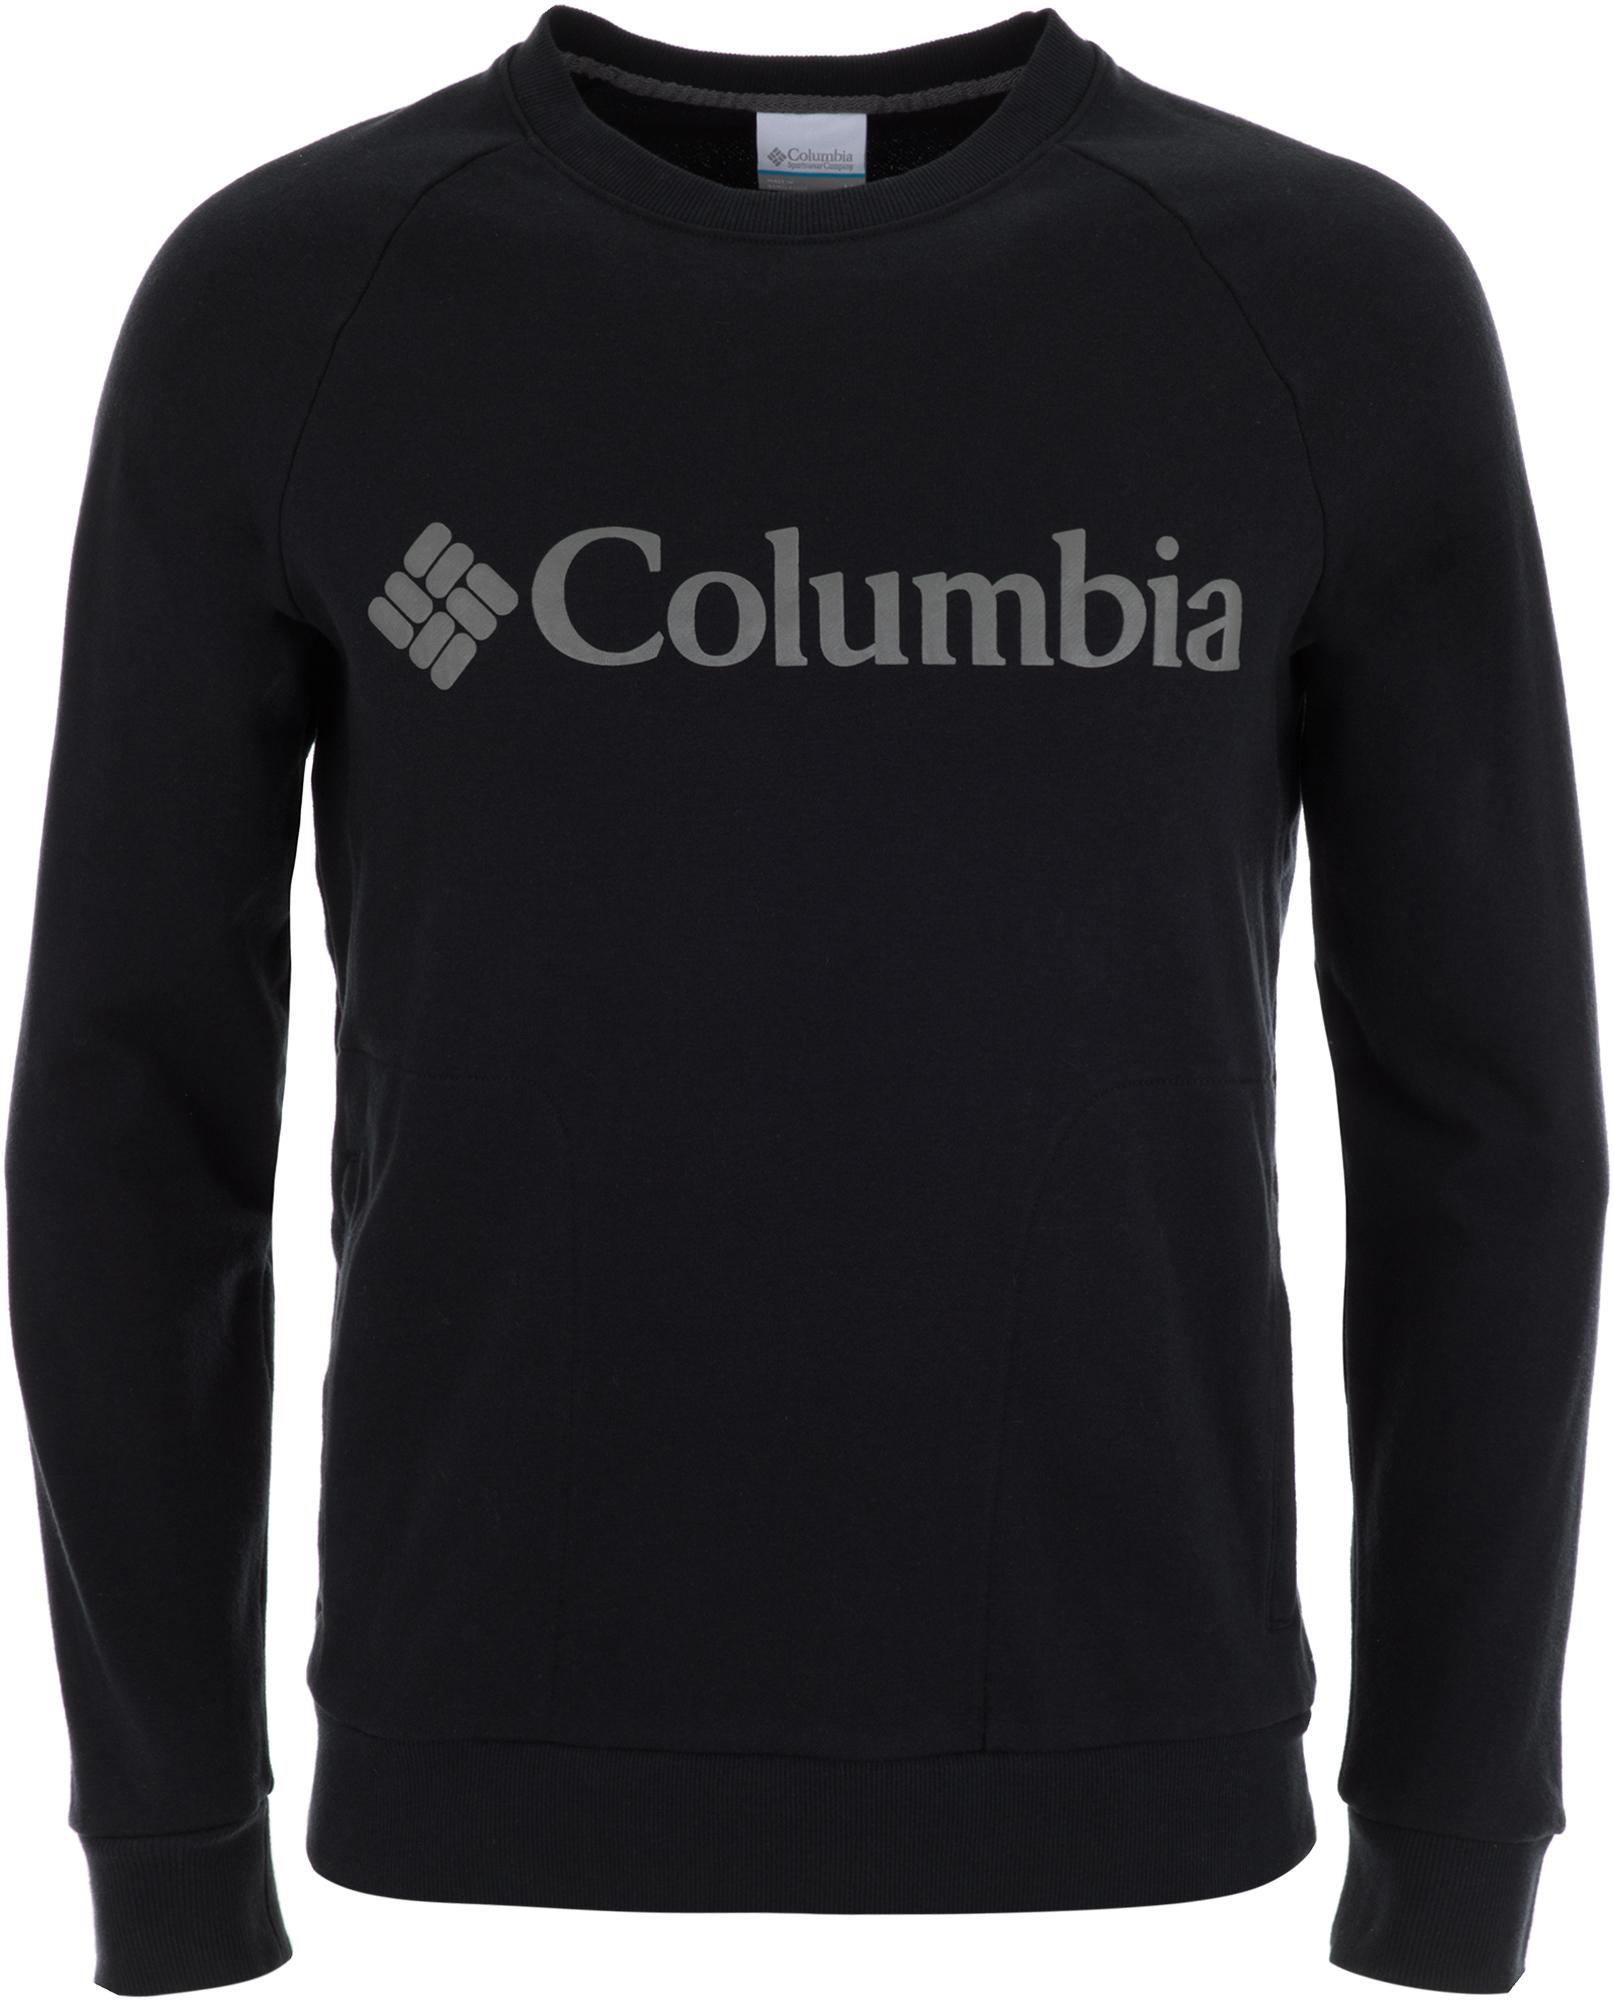 Columbia Джемпер мужской Columbia CSC M Bugasweat Crew, размер 56-58 цена